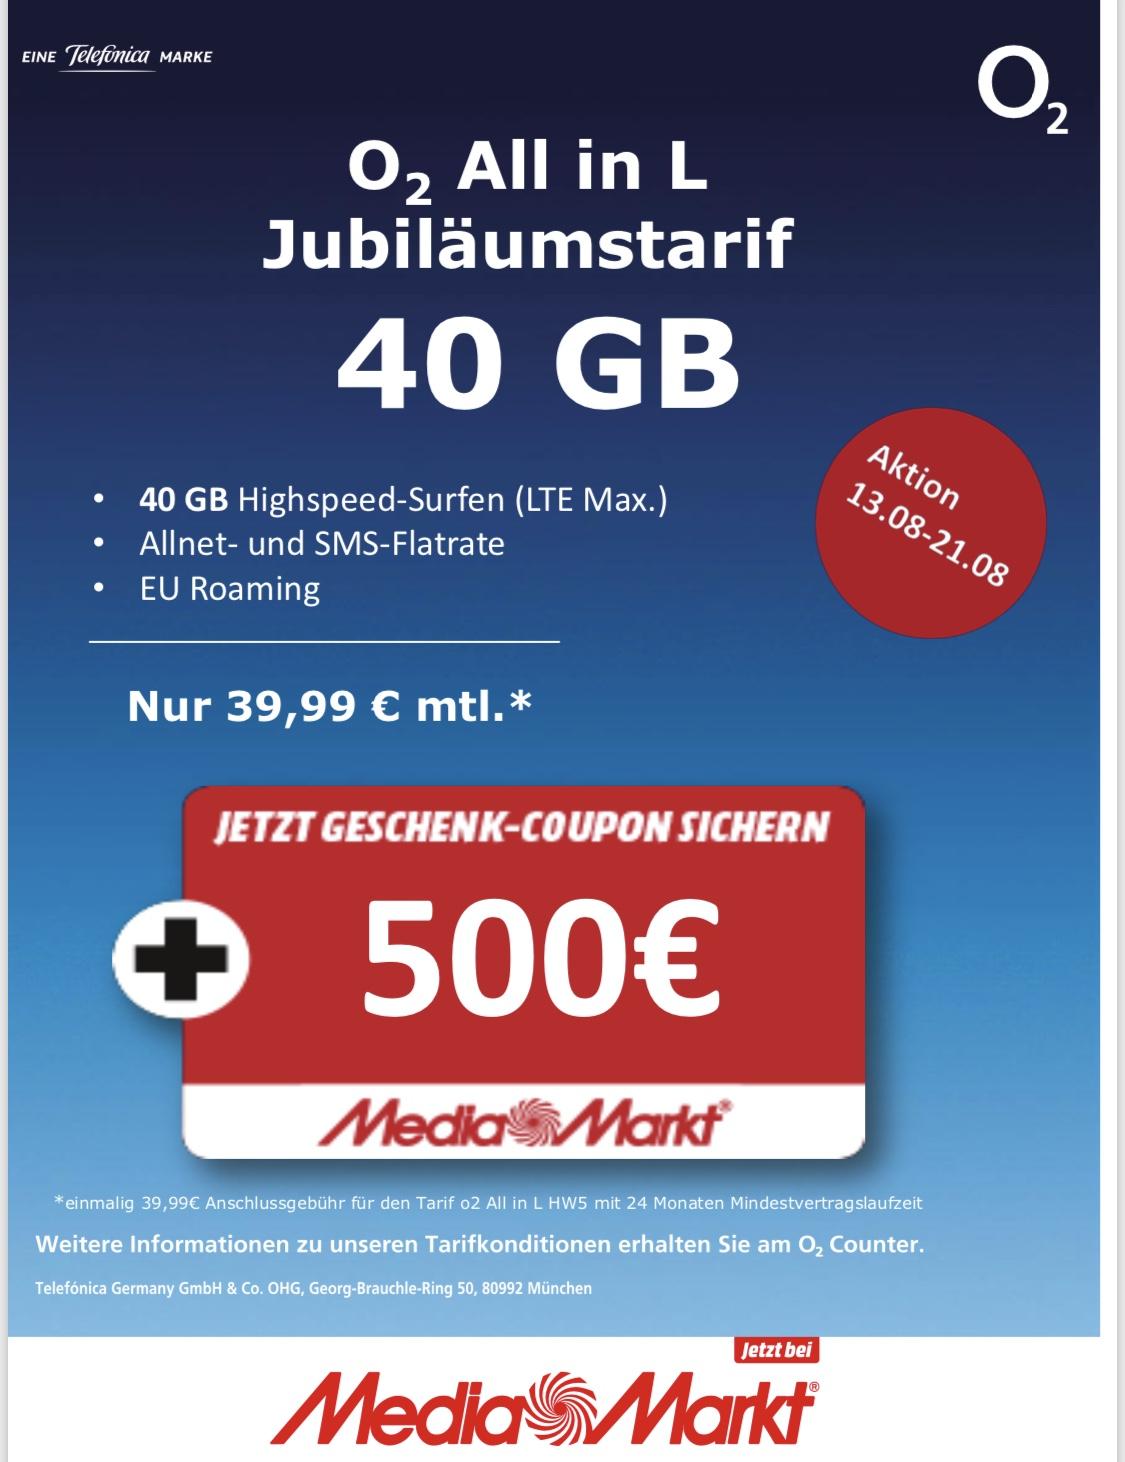 40 JAHRE MEDIAMARKT 40GB O2 + 500€ Media Markt Coupon